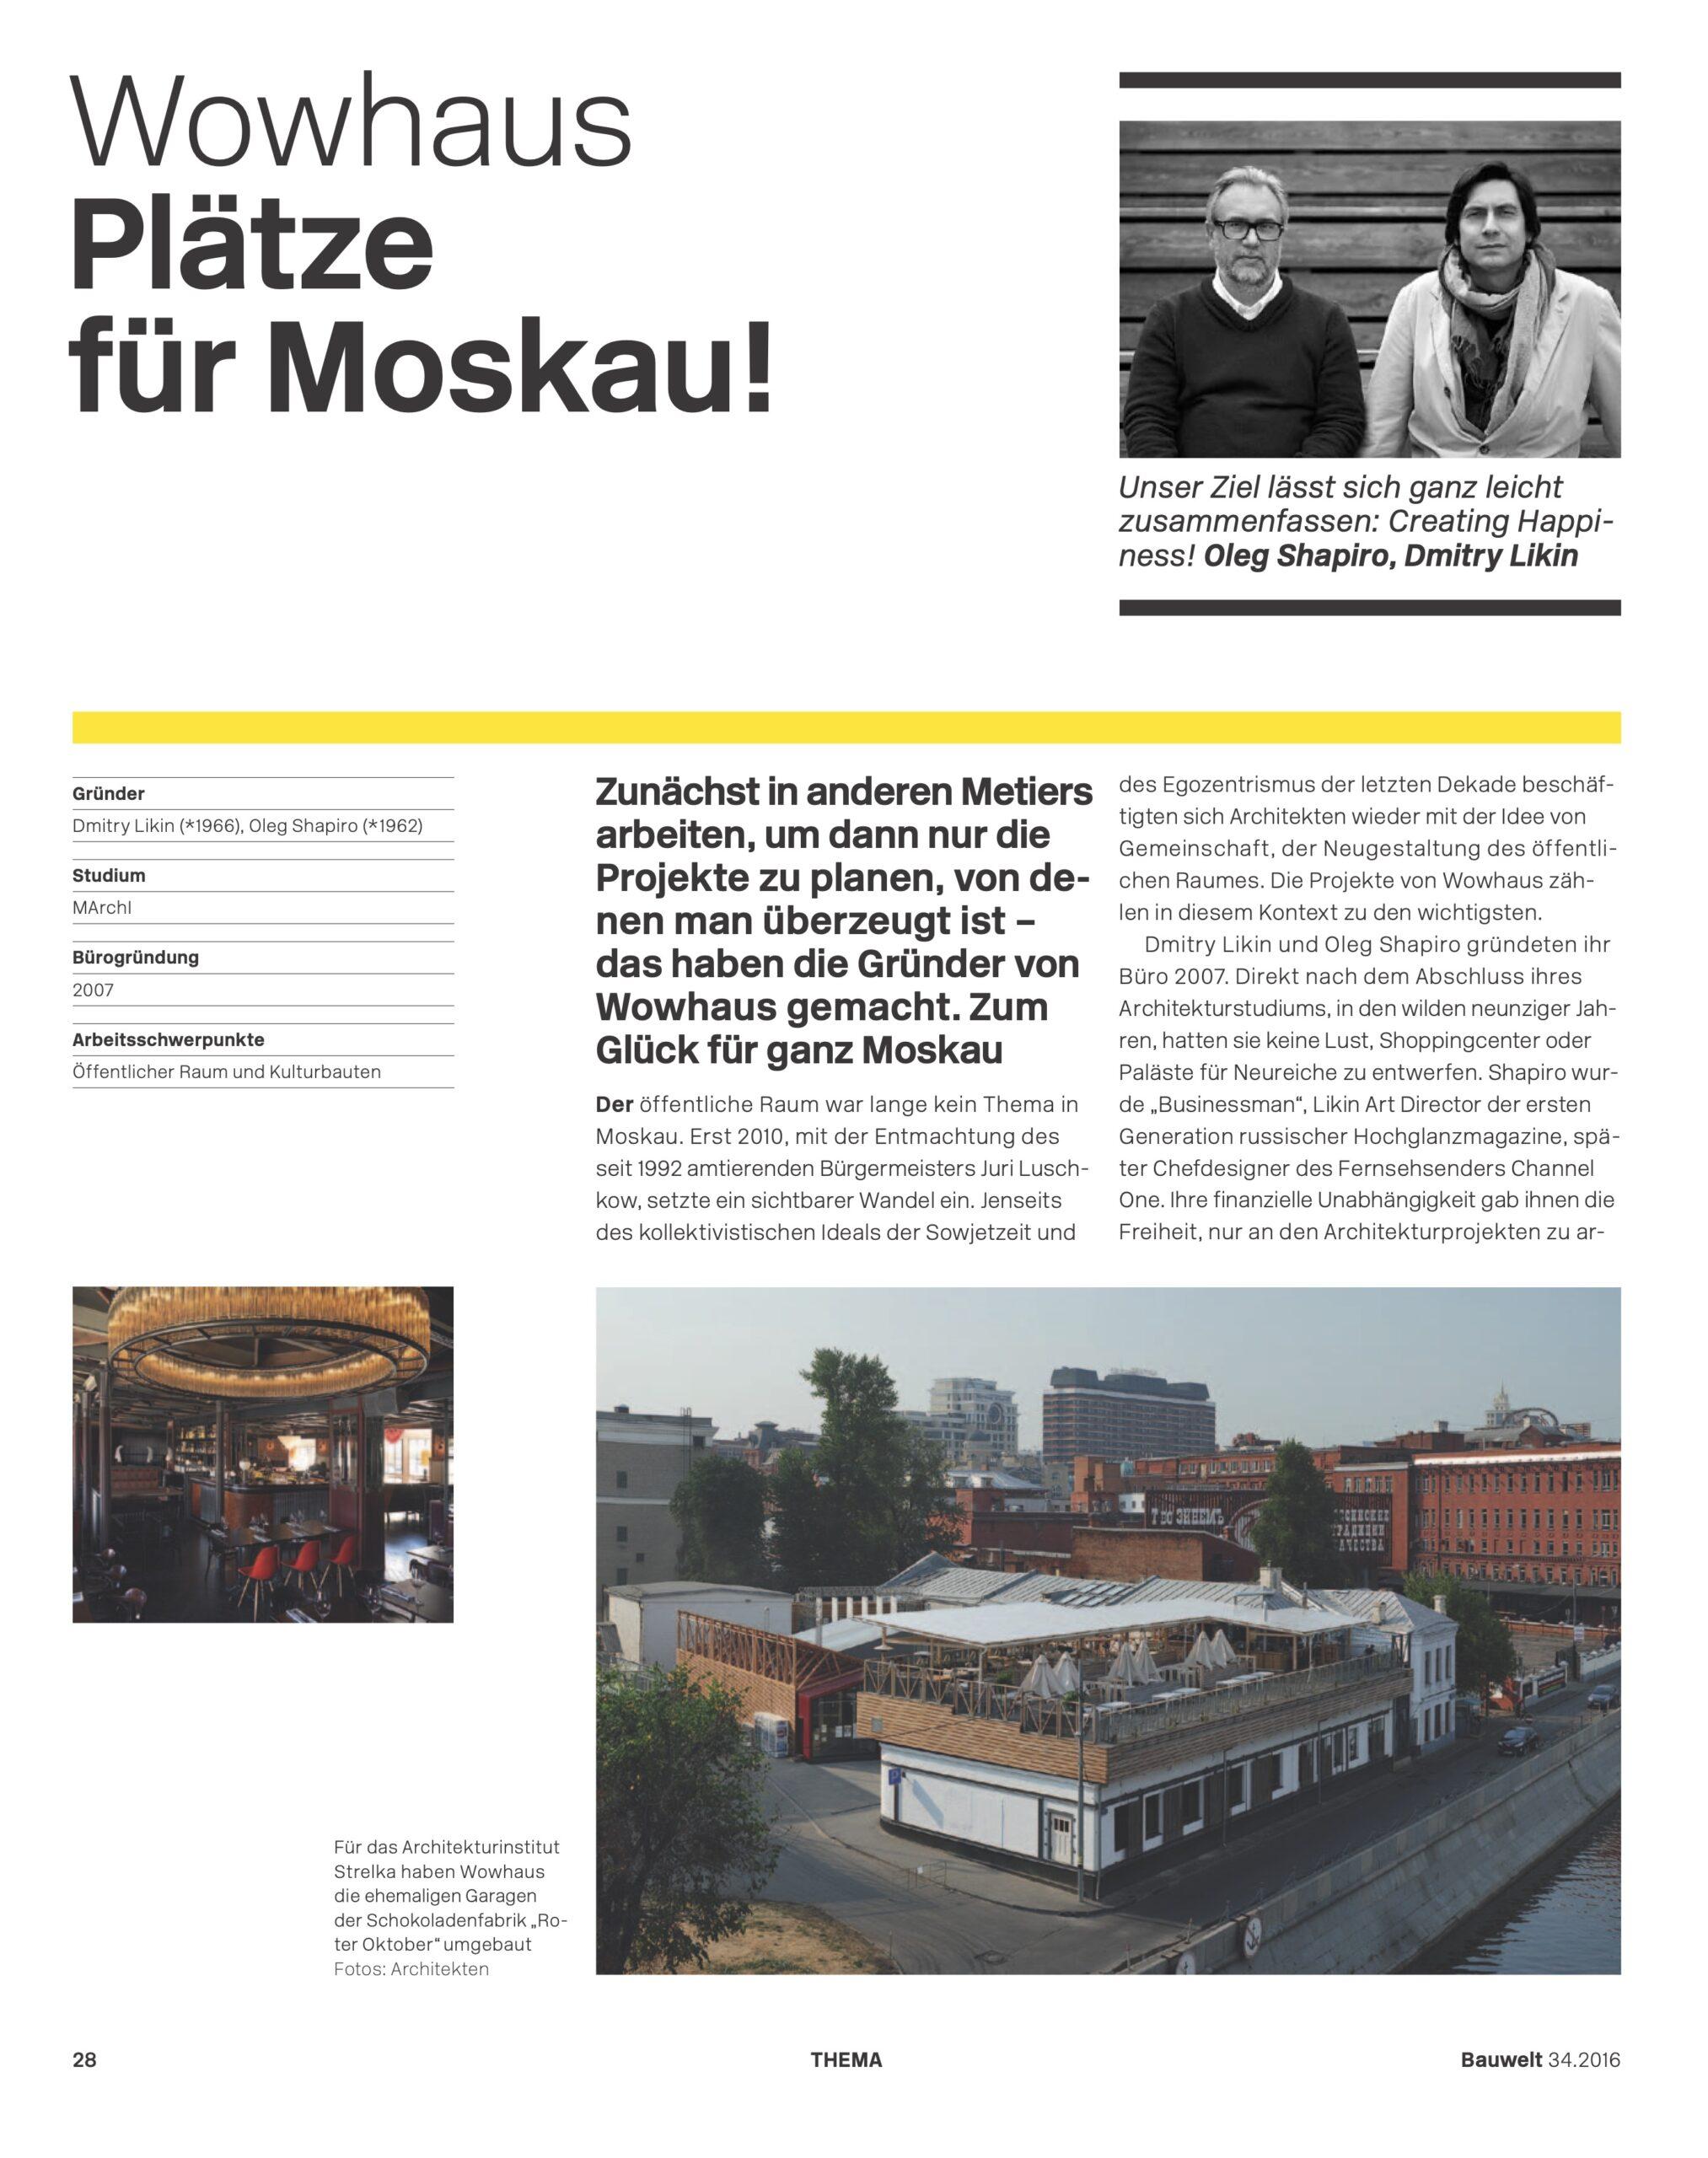 Bauwelt 34.2016 Young, hot and russian, Gastredaktion Nadin Heinich